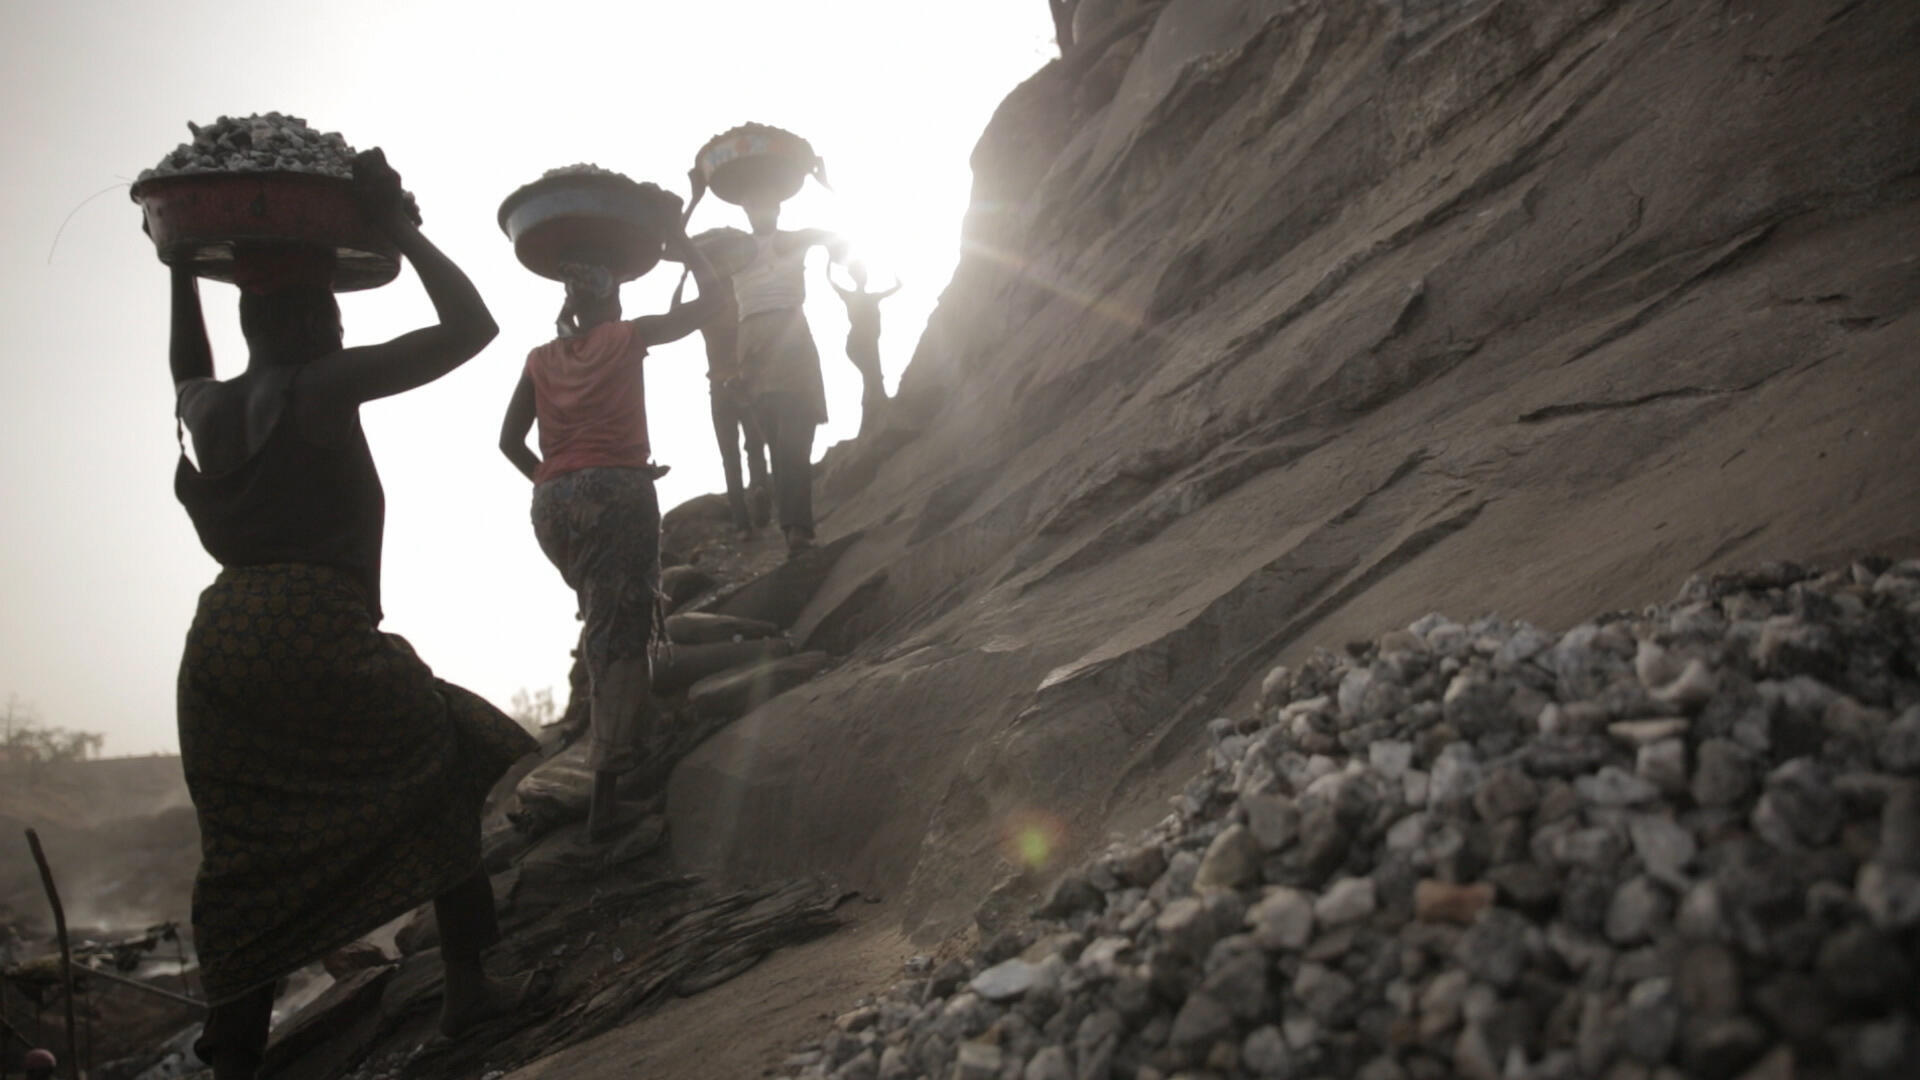 « Le Loup d'or de Balolé », documentaire d'Aïcha Chloé Boro (Burkina Faso), programmé au Fipadoc 2020.